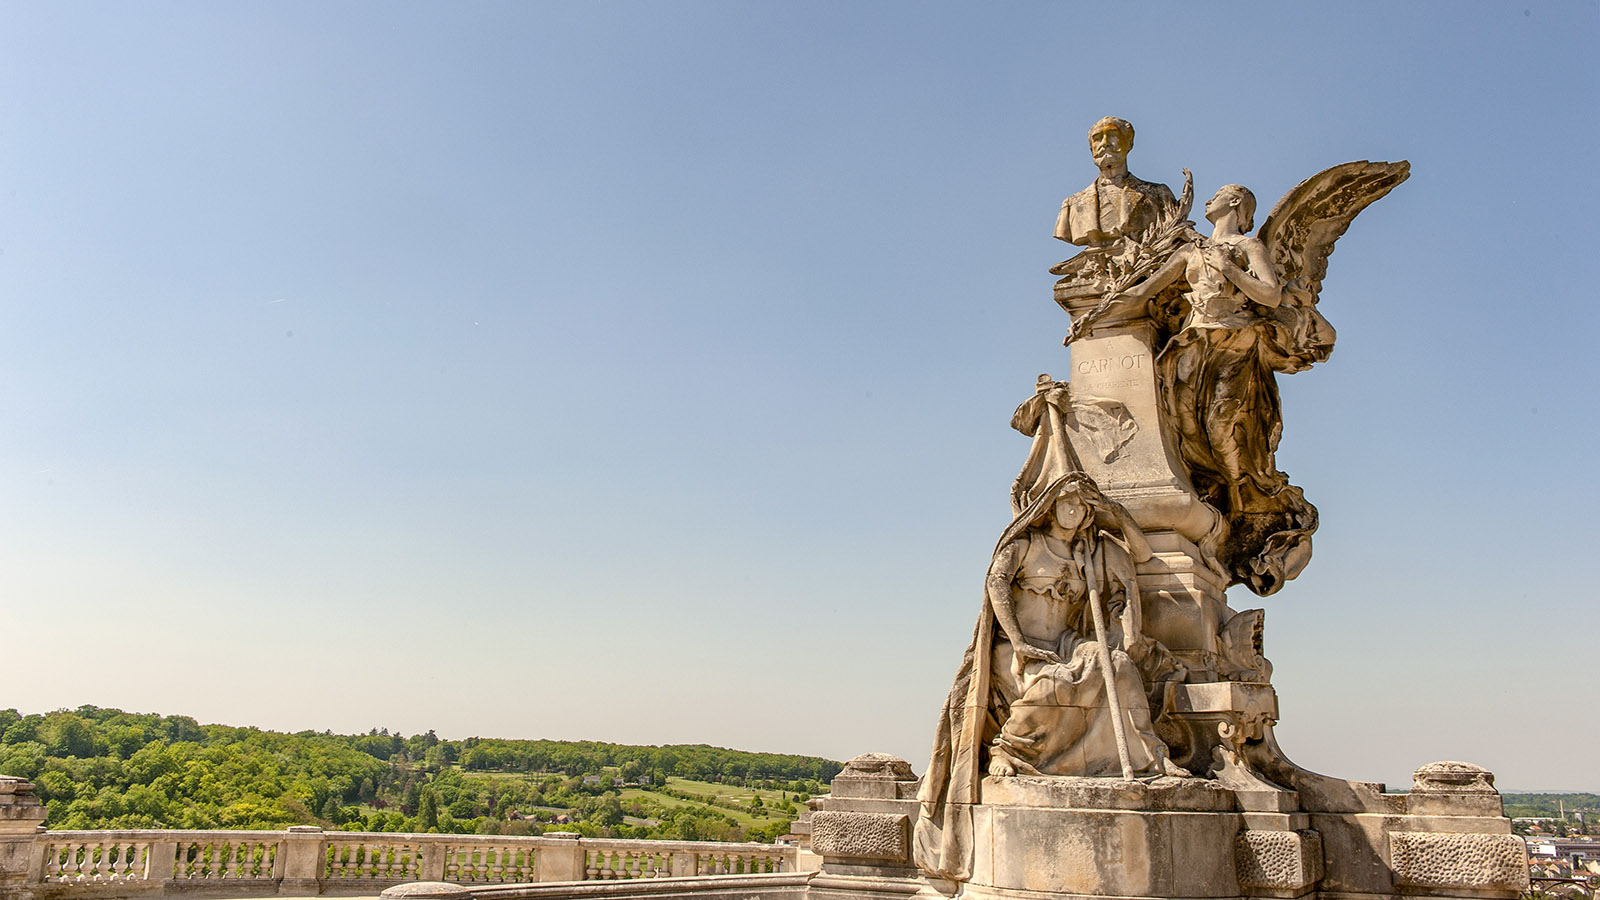 Denkmal in Angoulême. Foto: Hilke maunder